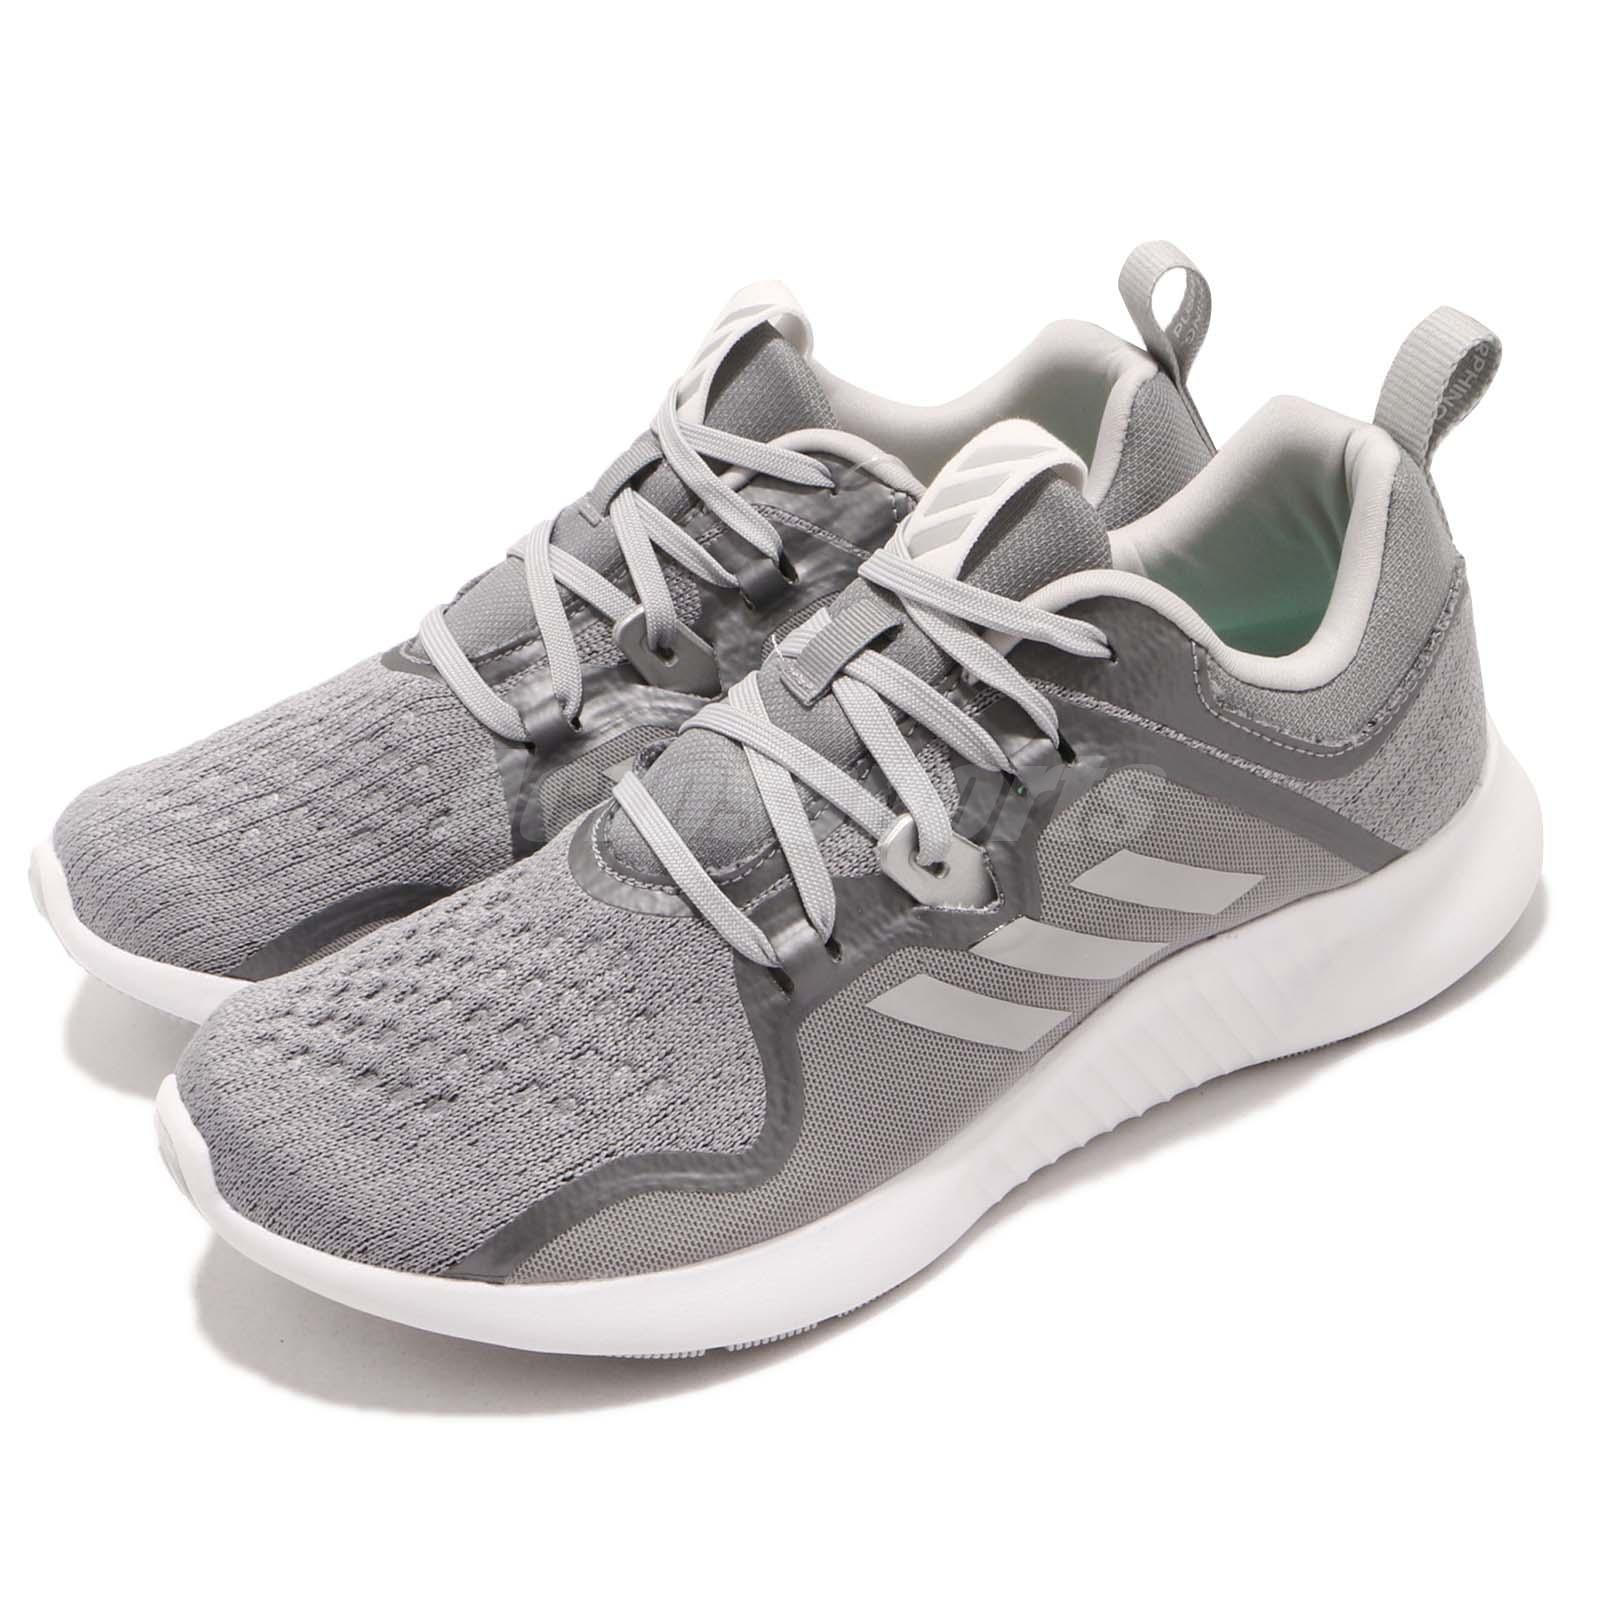 adidas EdgeBOUNCE W Grey White BOUNCE